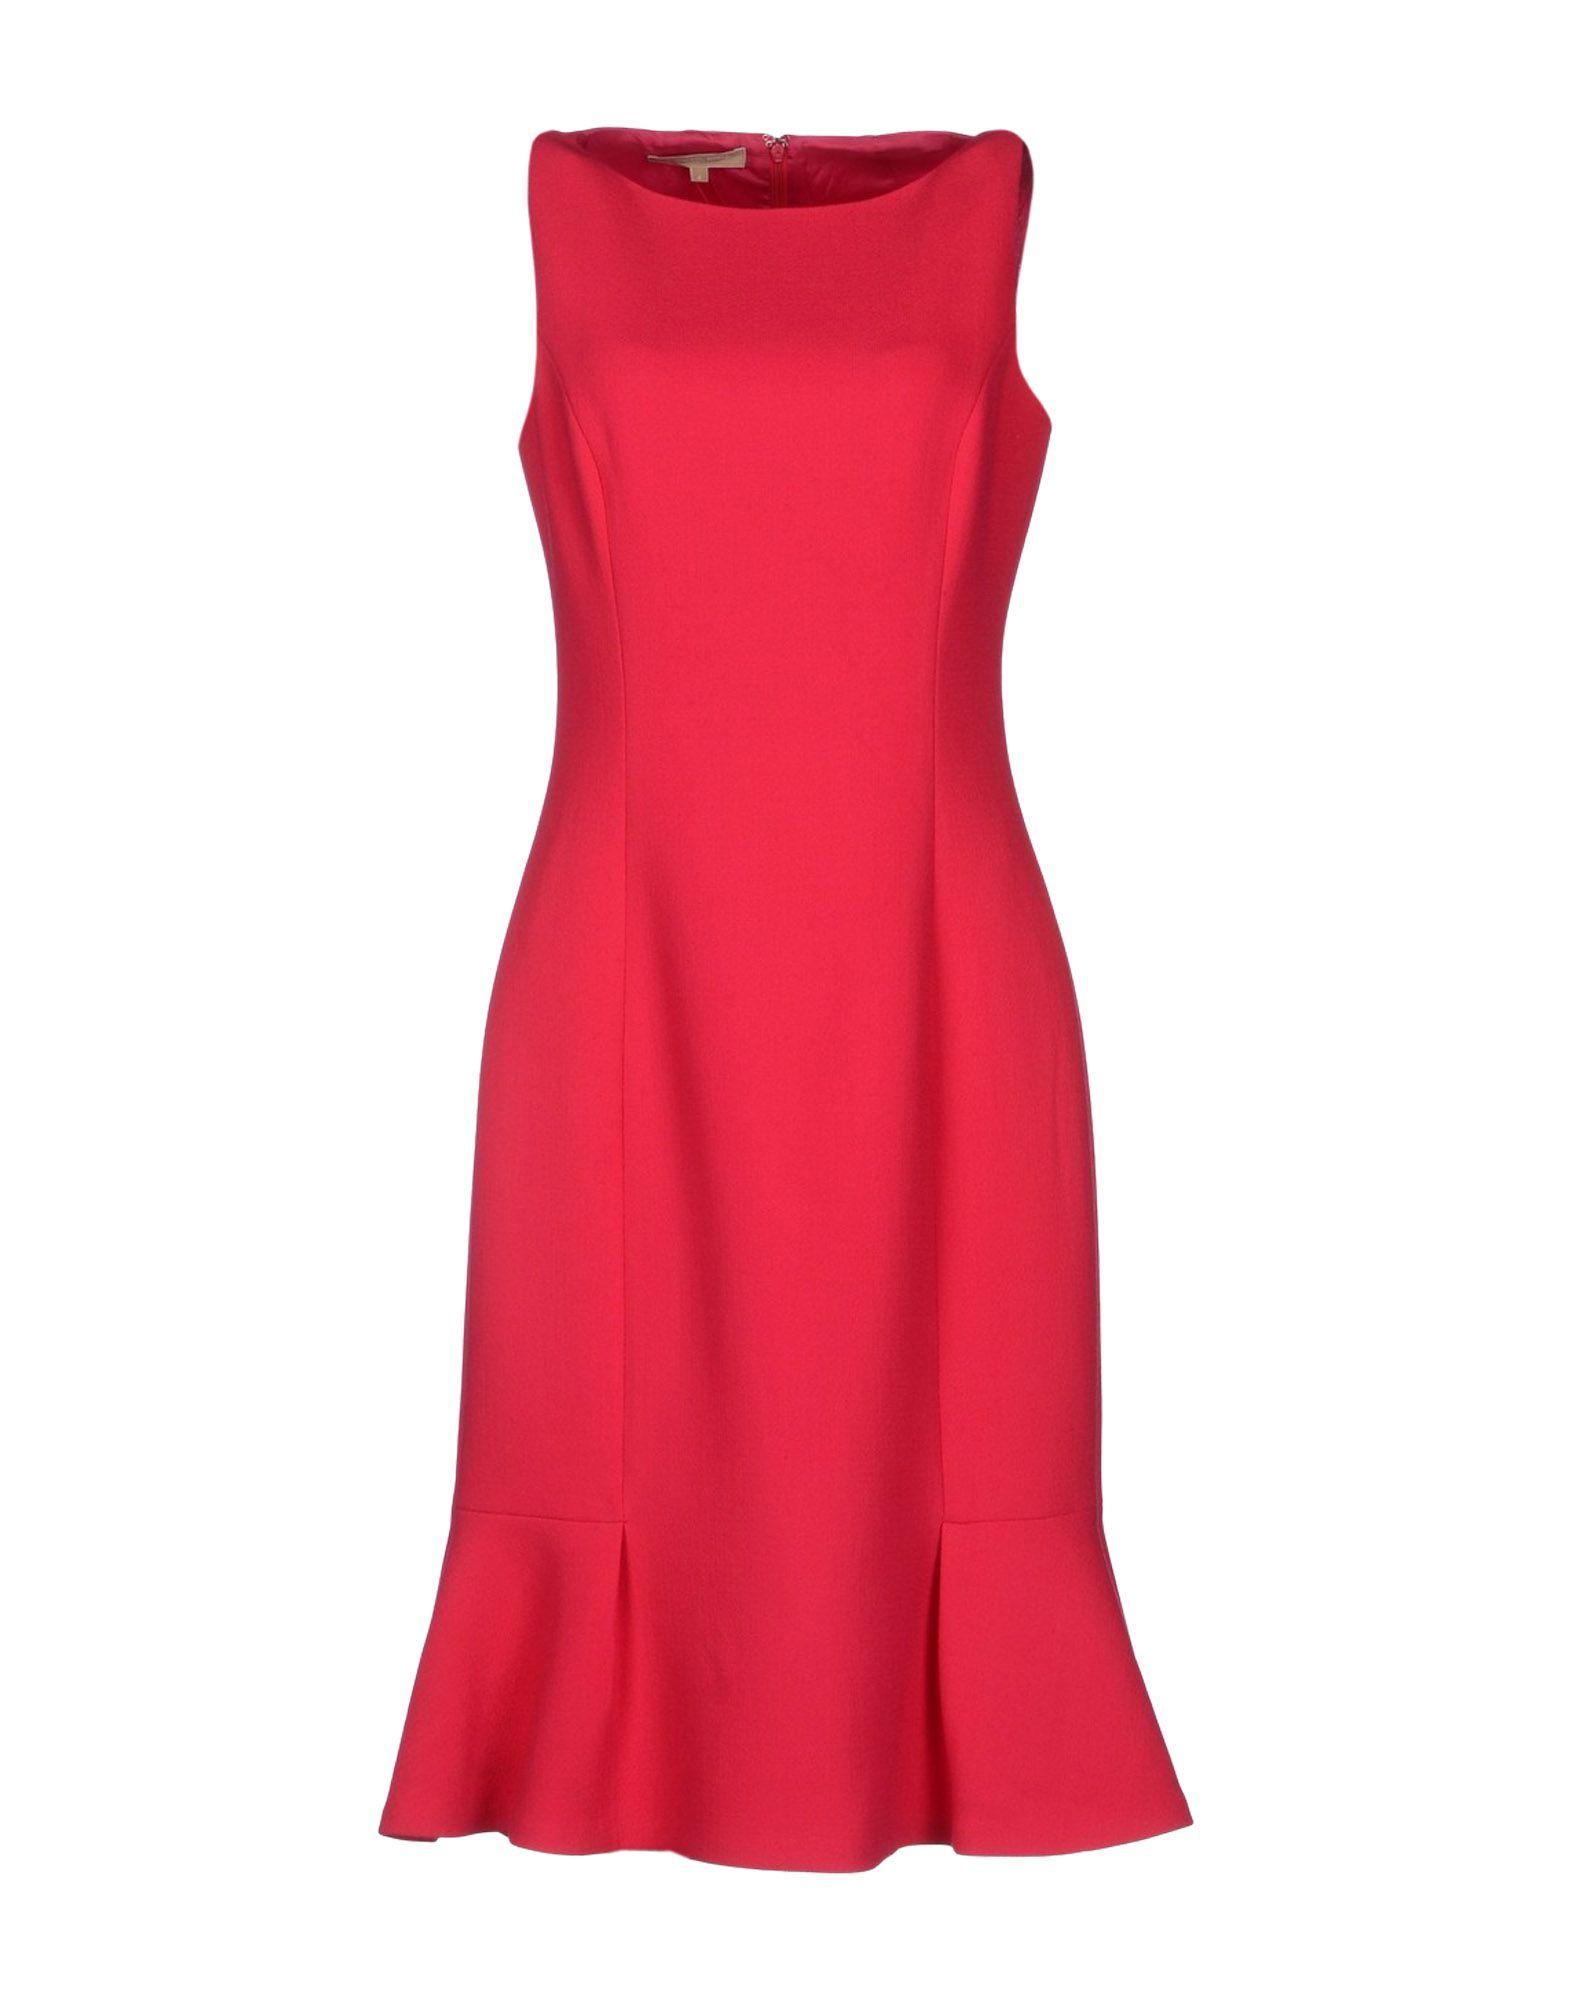 Michael Kors Knee-Length Dress in Pink (Garnet)